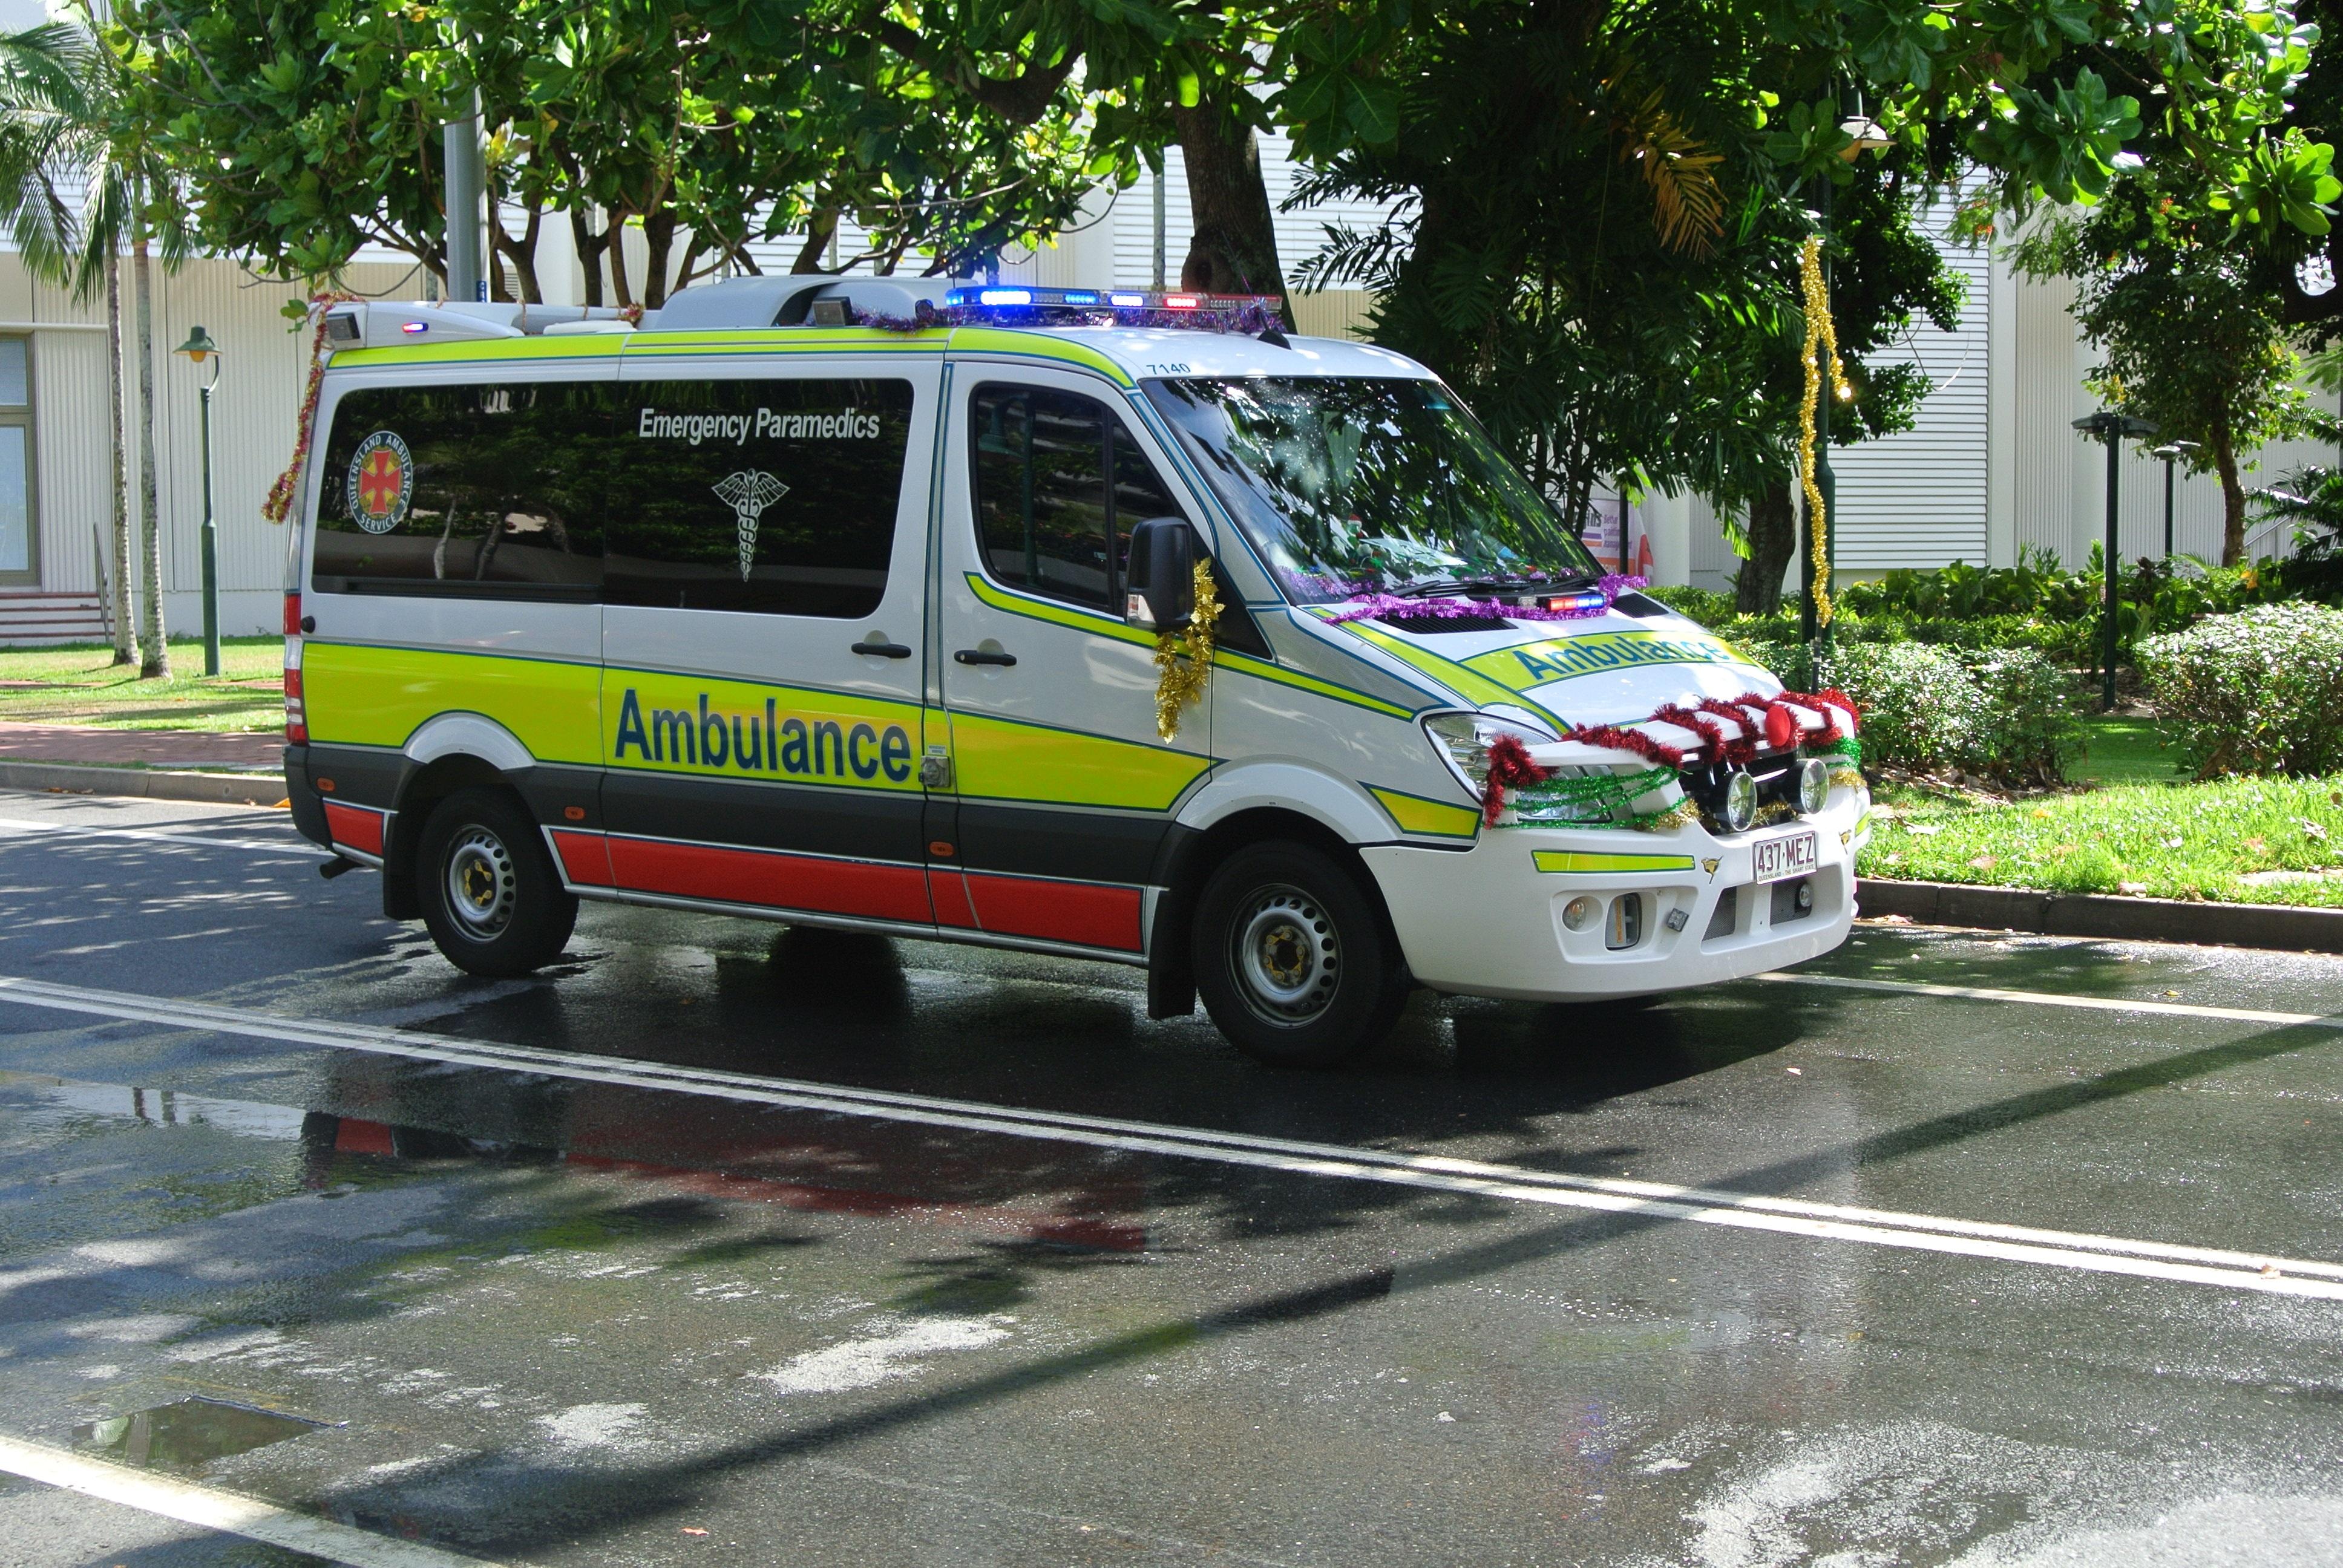 Free Images Car Van Public Transport Parade Minibus Ambulance